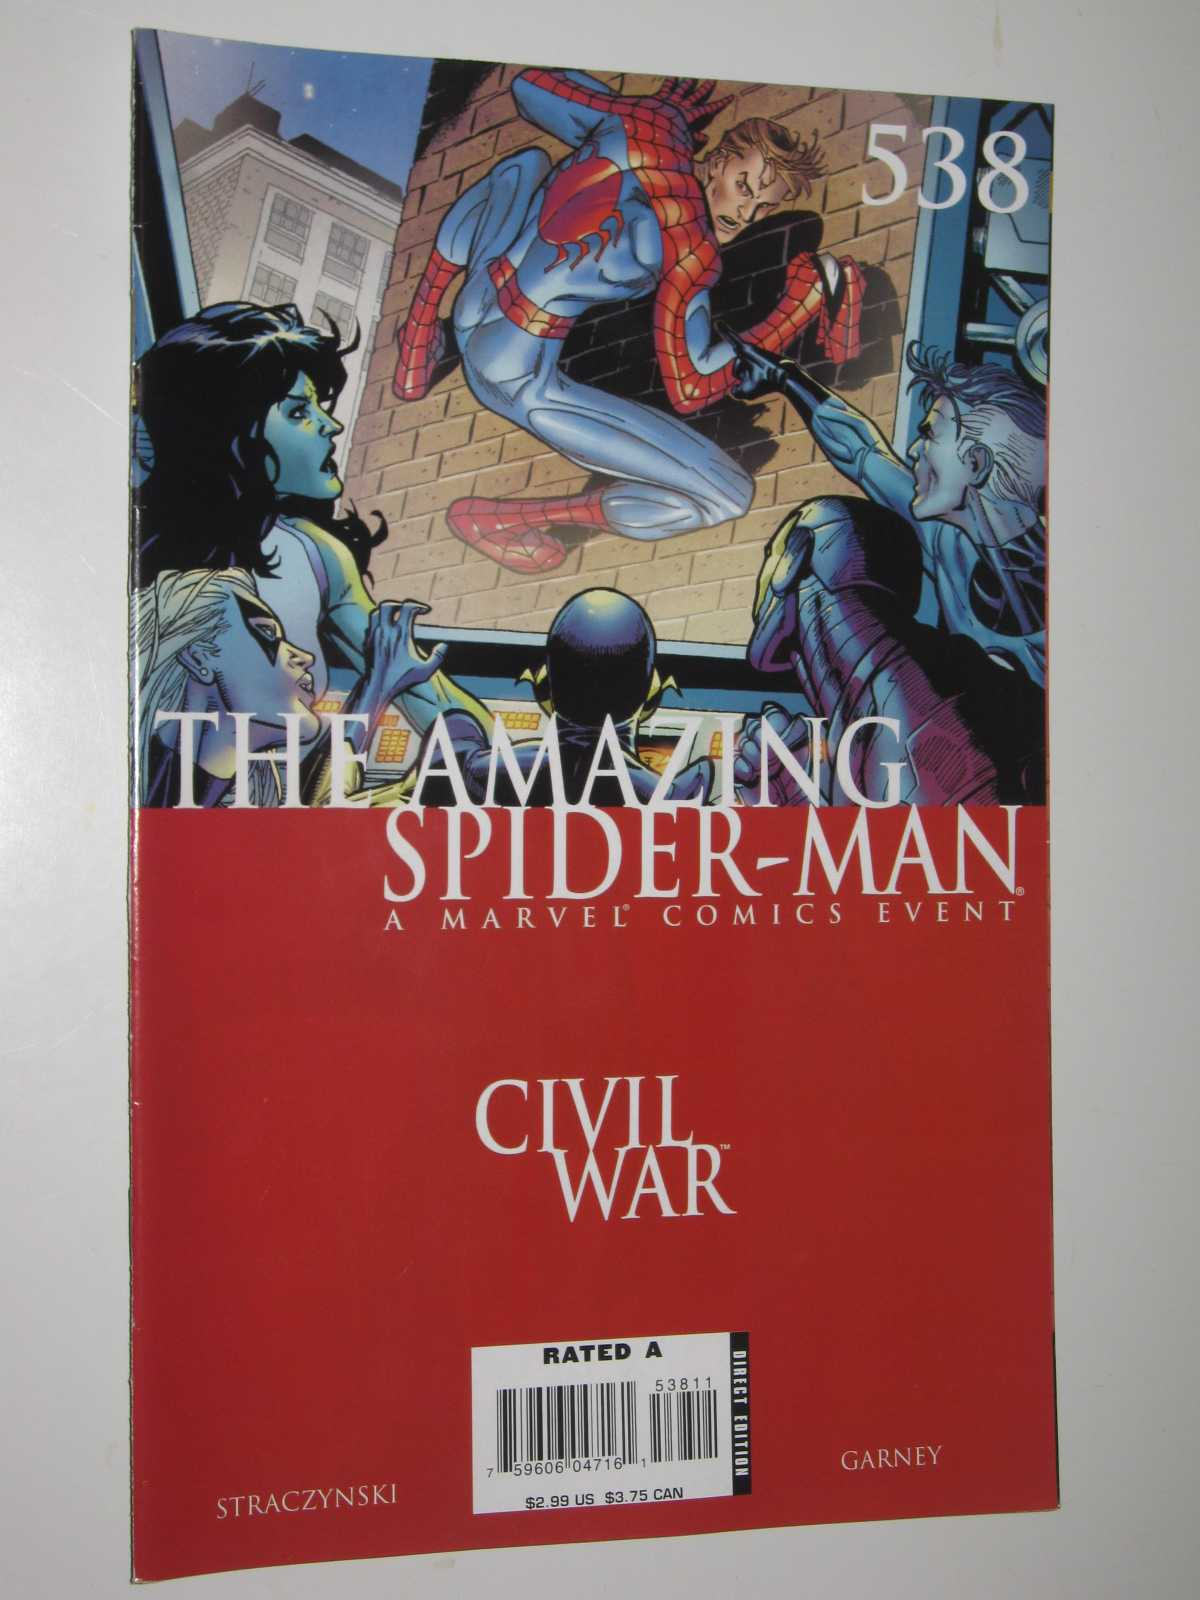 Amazing Spider-man #538 - Civil War: The War At Home Part 7 of 7, Straczynski, J. Michael